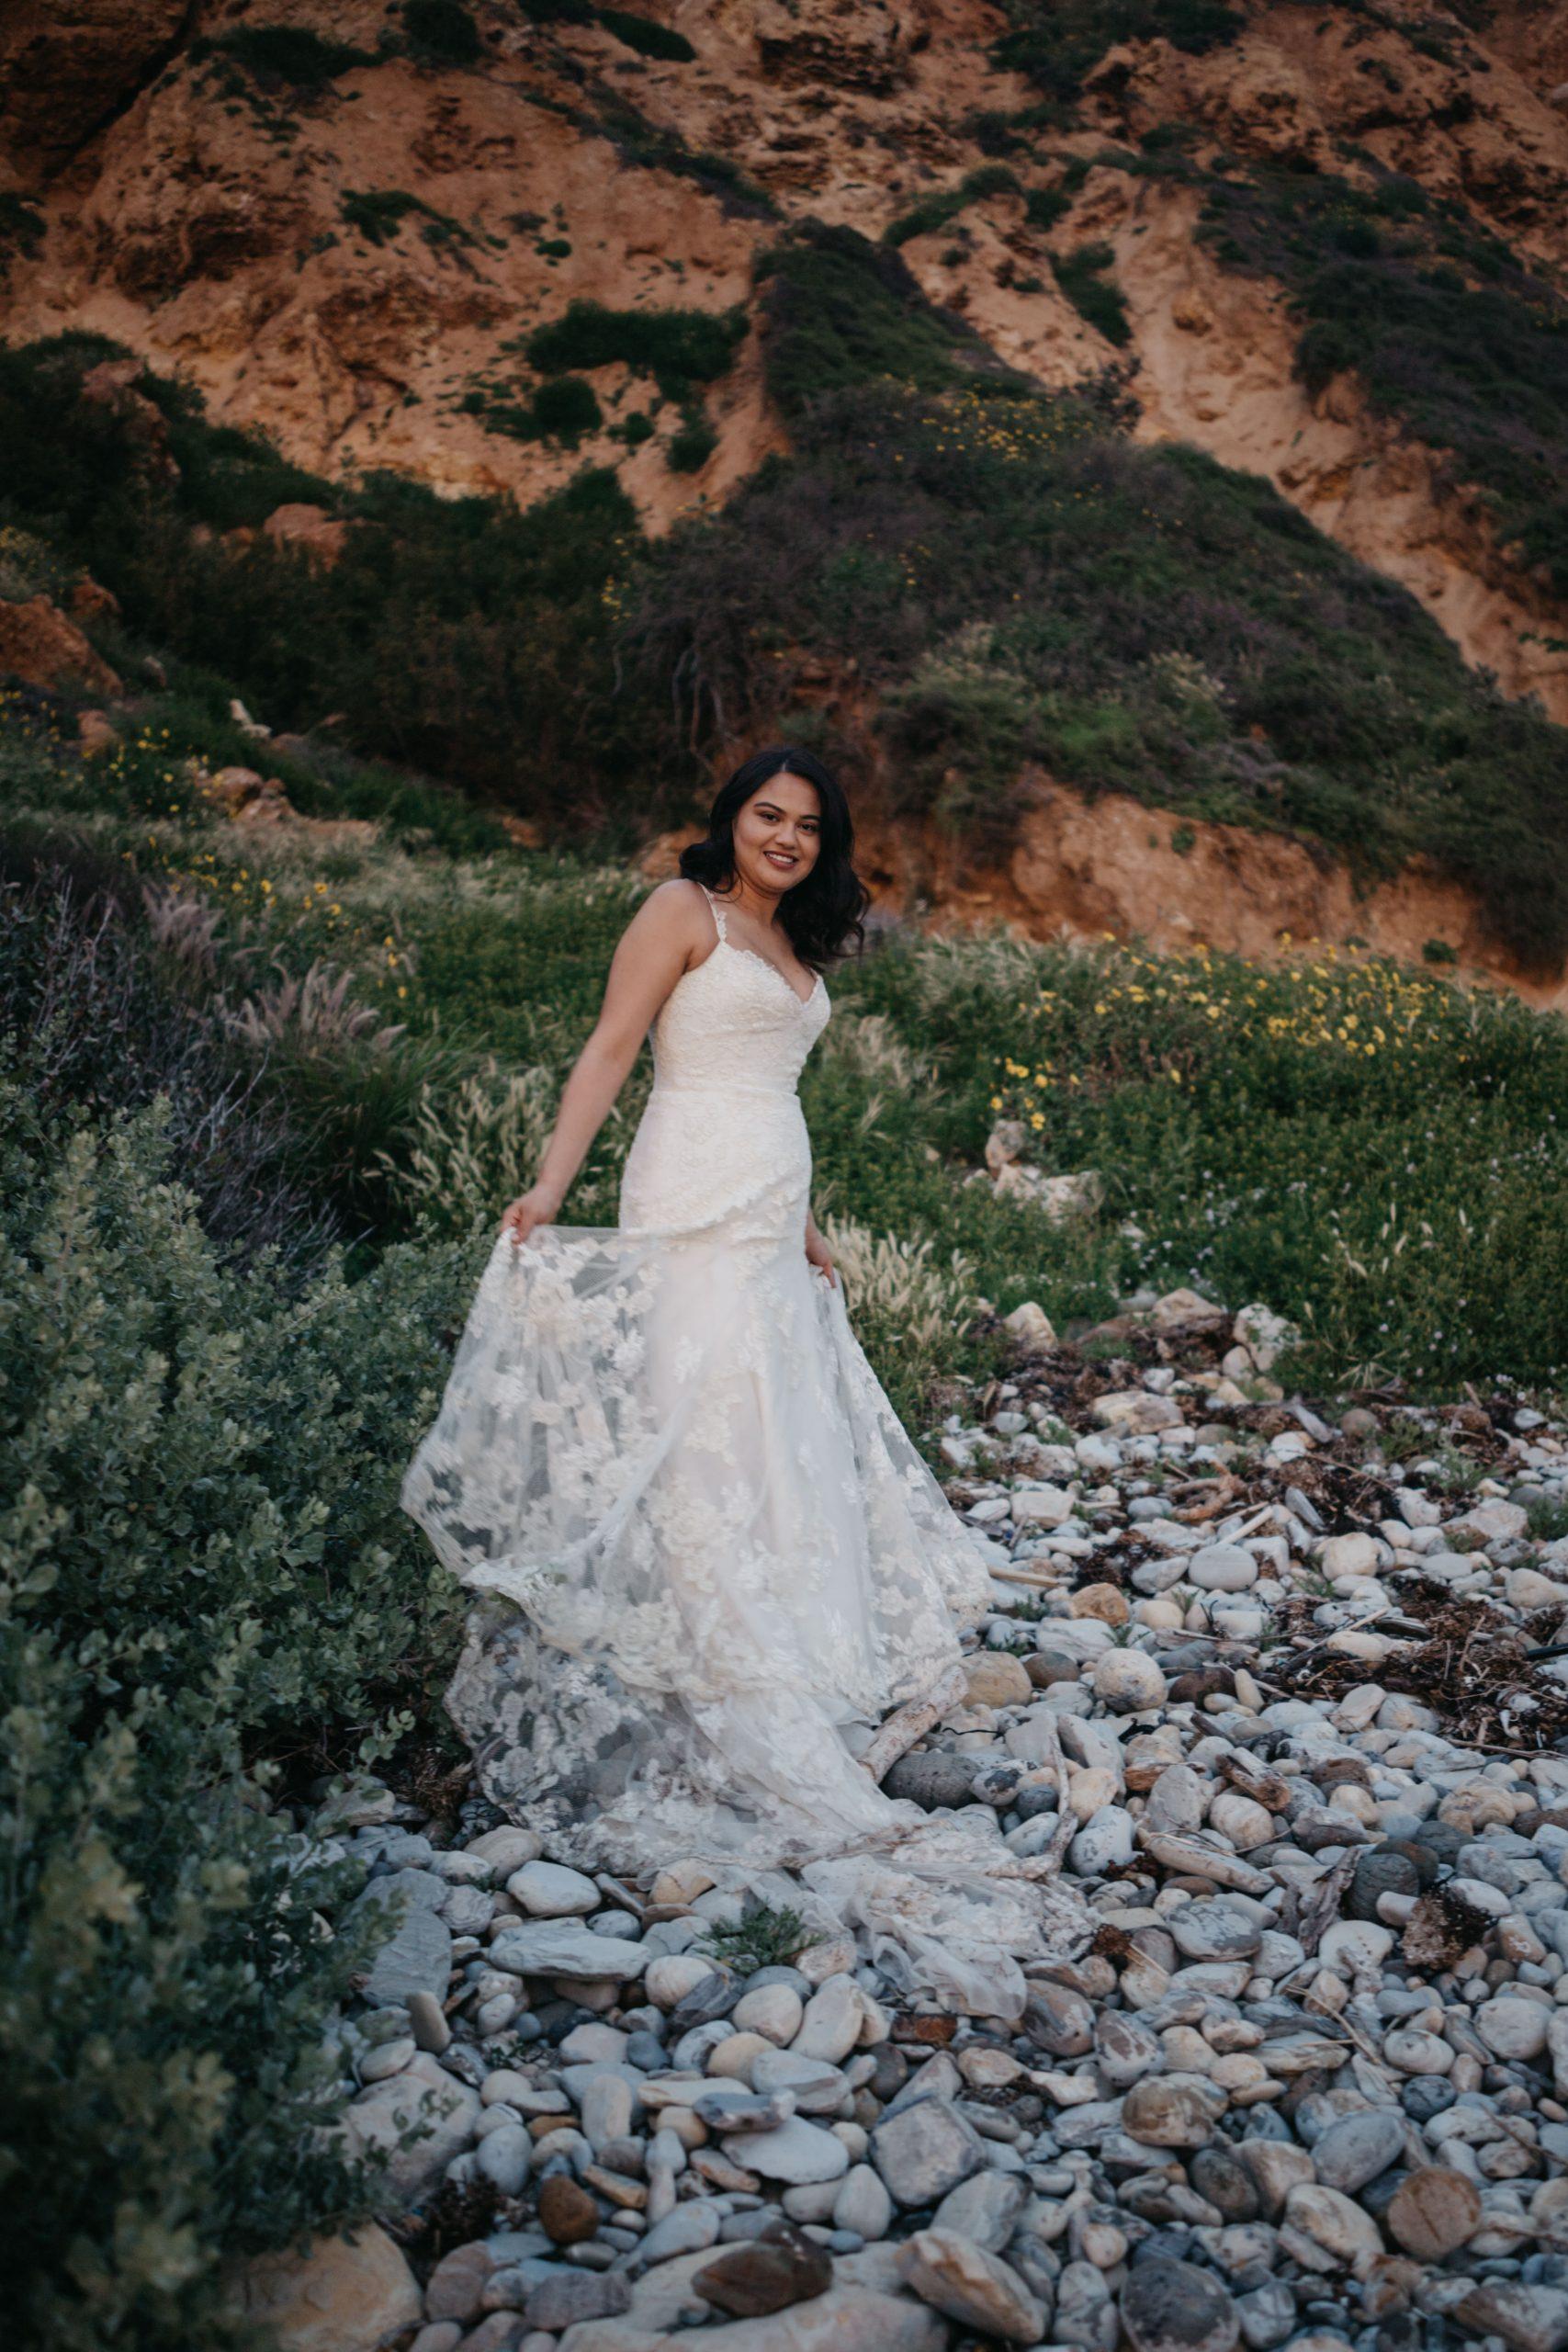 Bride portrait, image by Fatima Elreda Photo